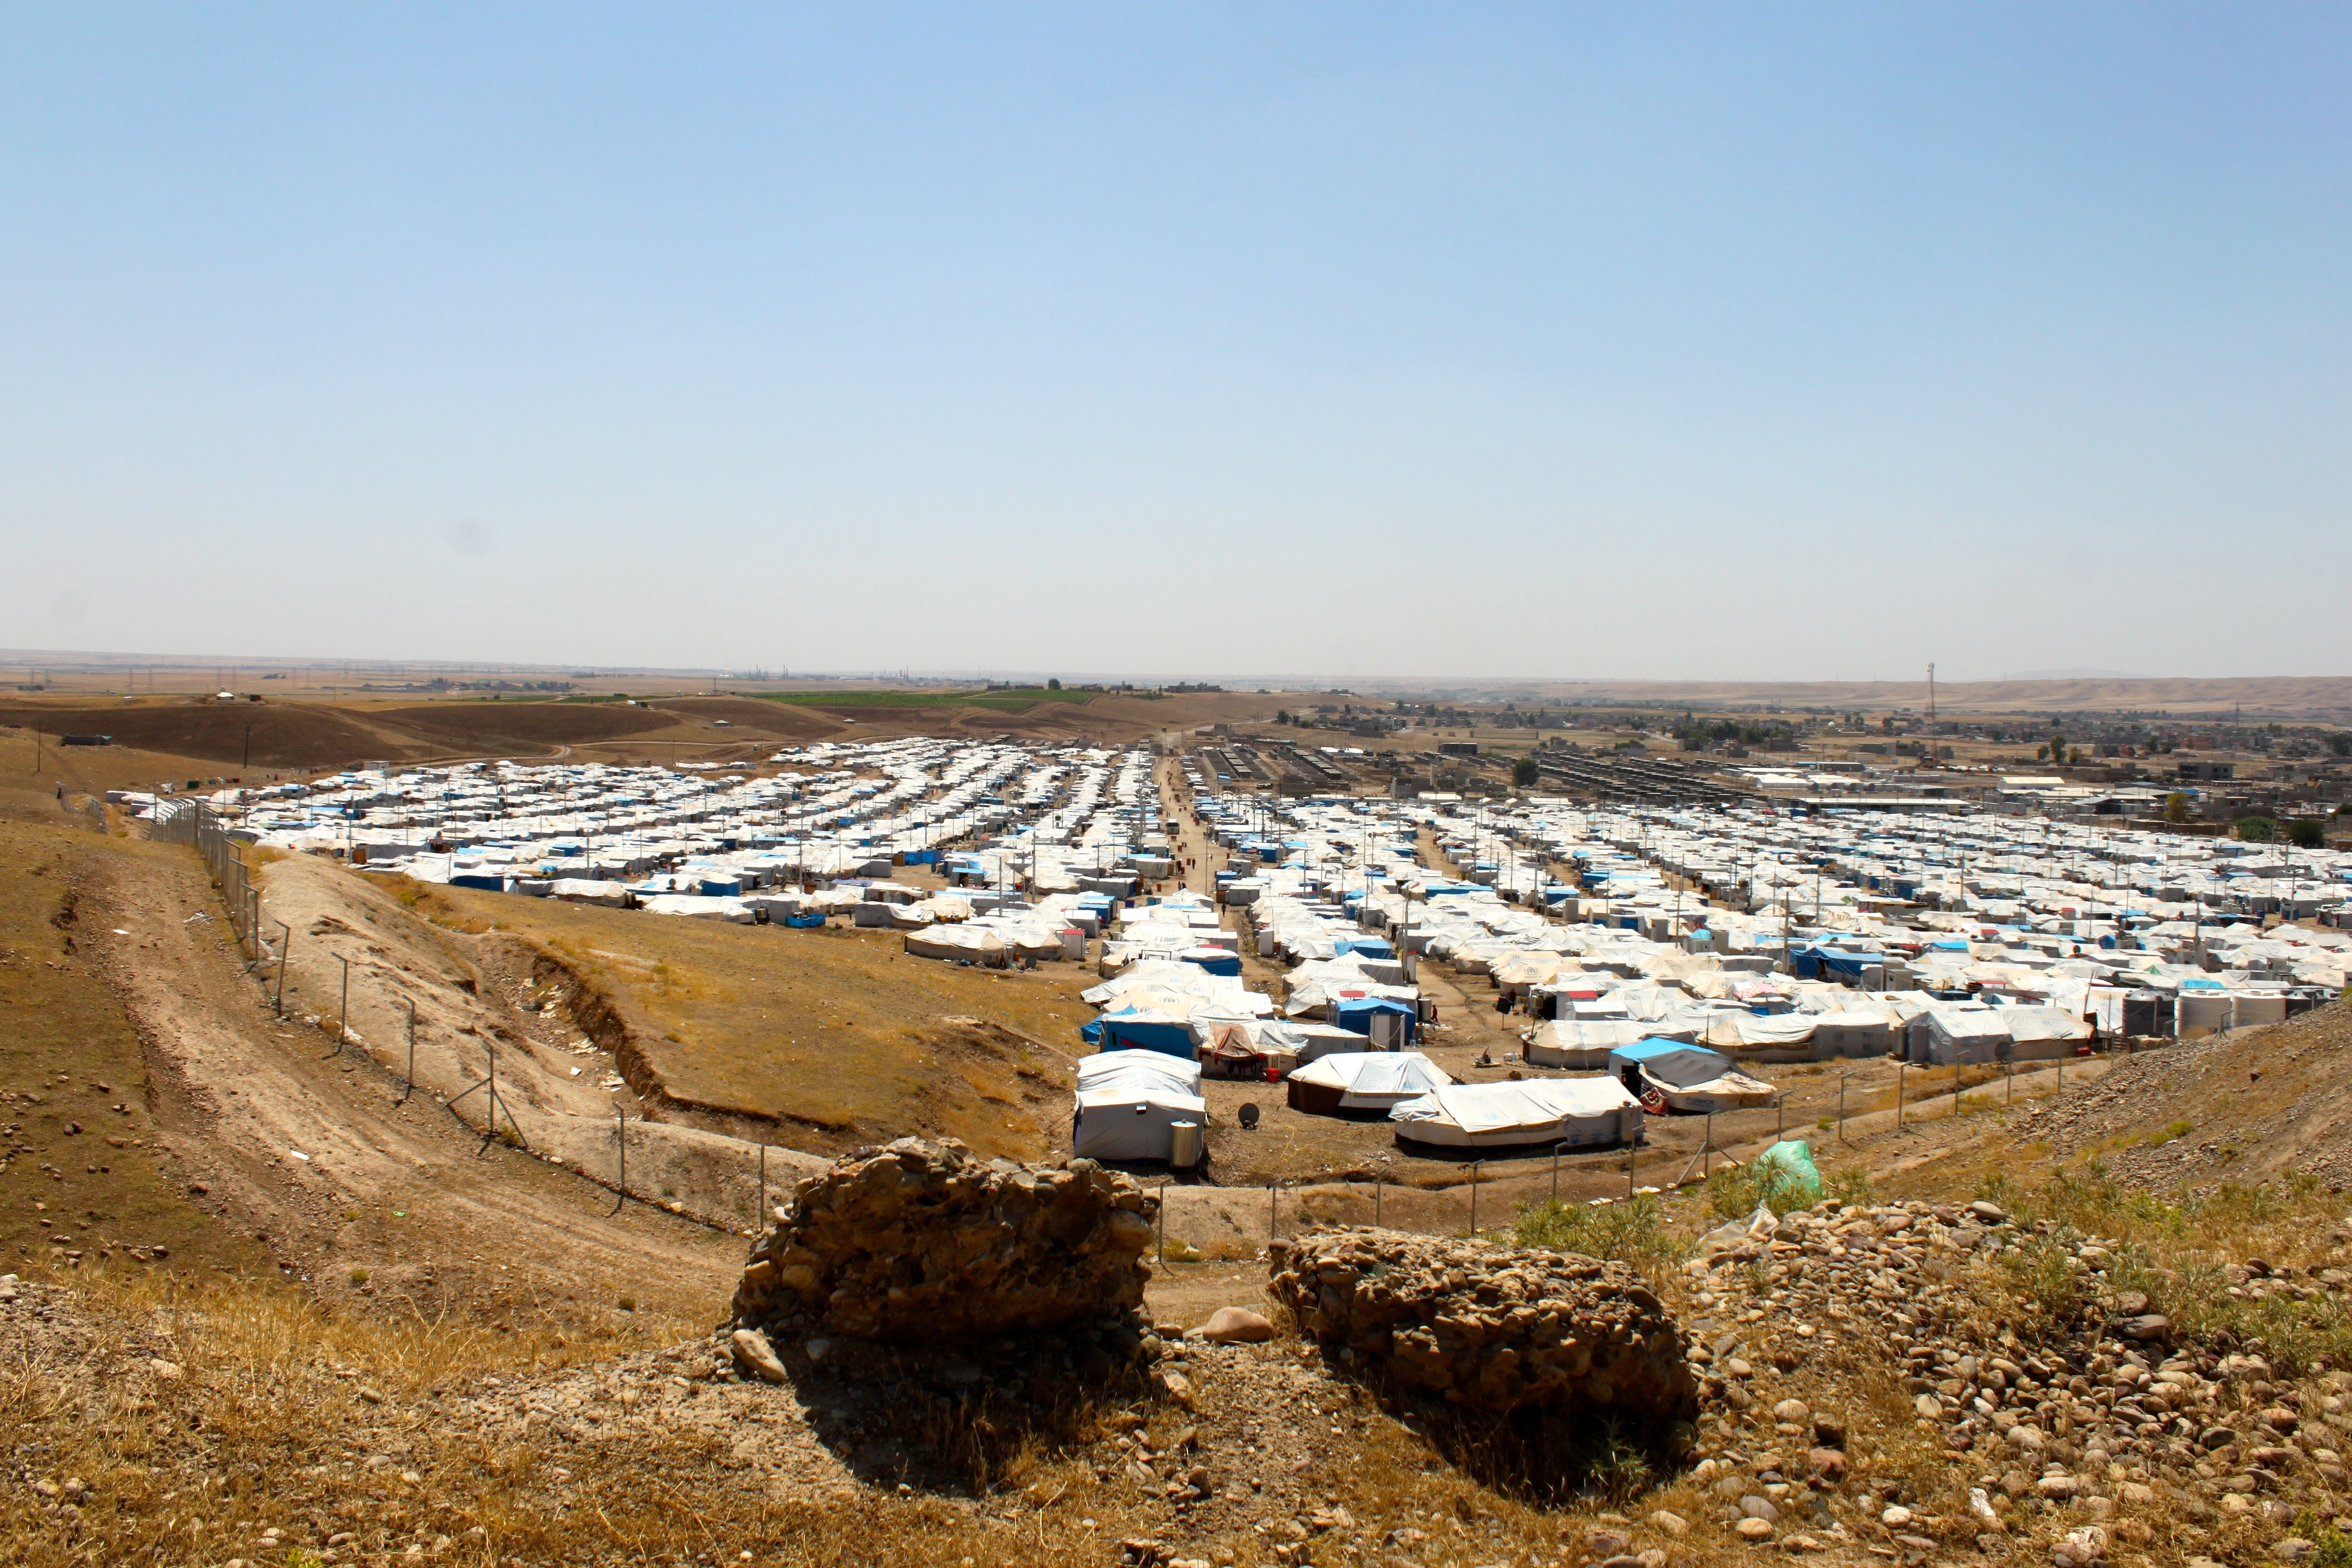 kawergosk refugee camp